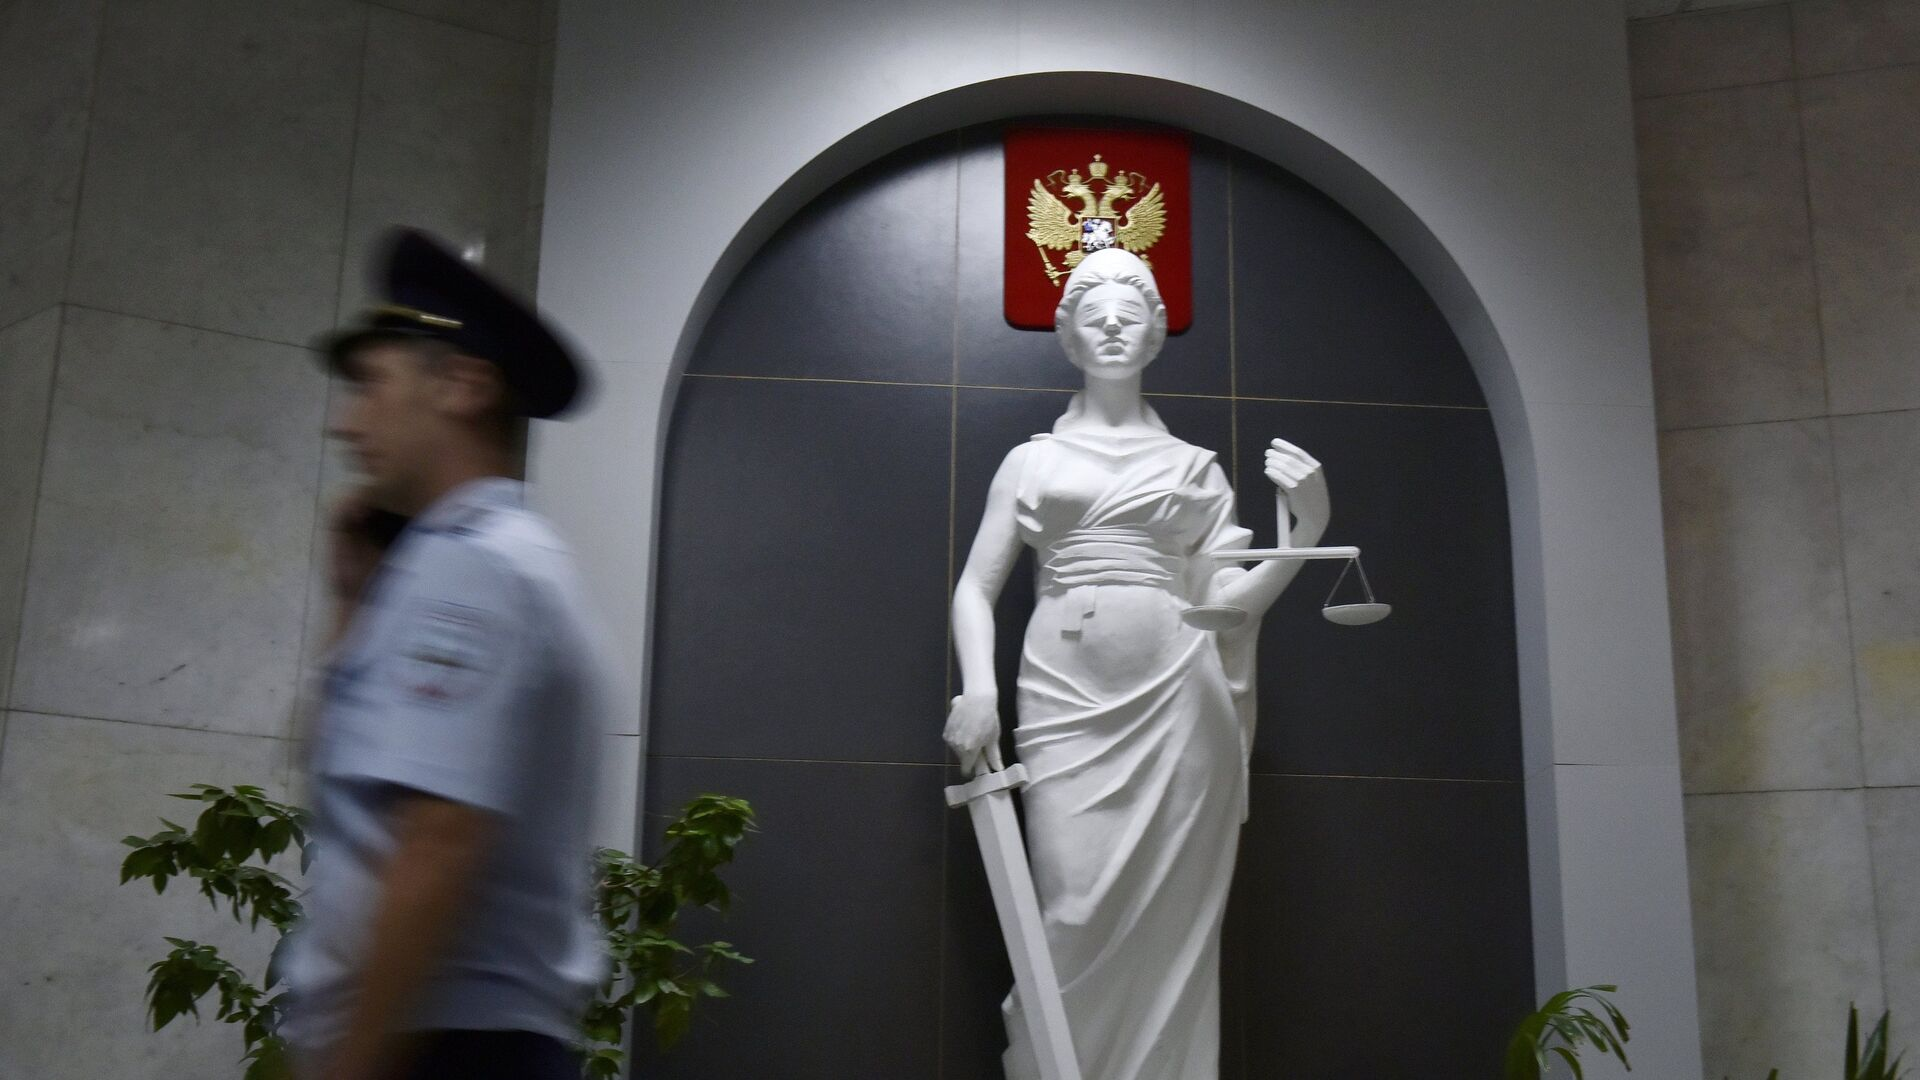 В здании суда - РИА Новости, 1920, 04.03.2021